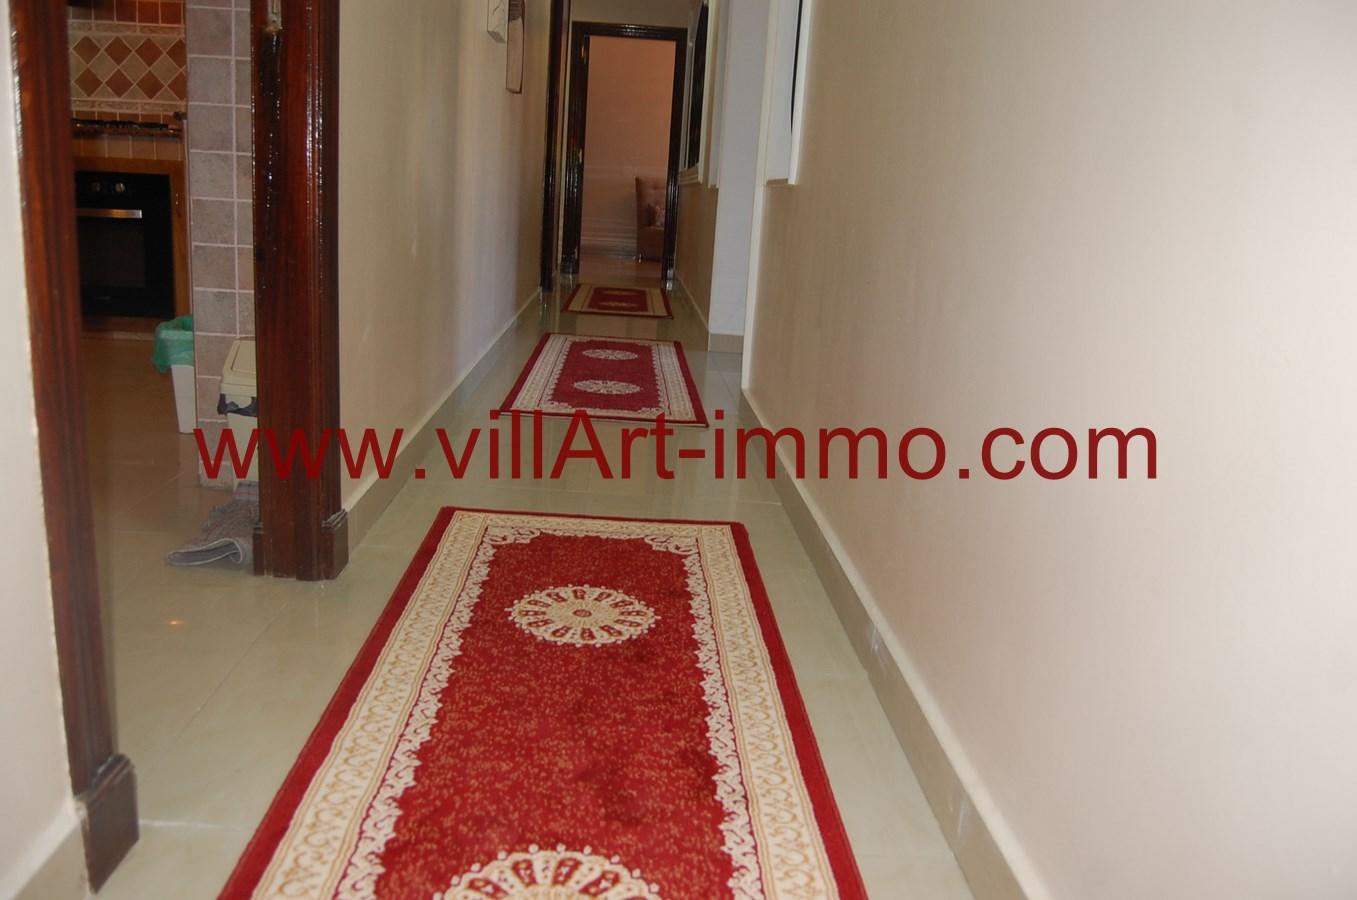 8-location-appartement-meuble-iberia-tanger-couloir-l895-villart-immo